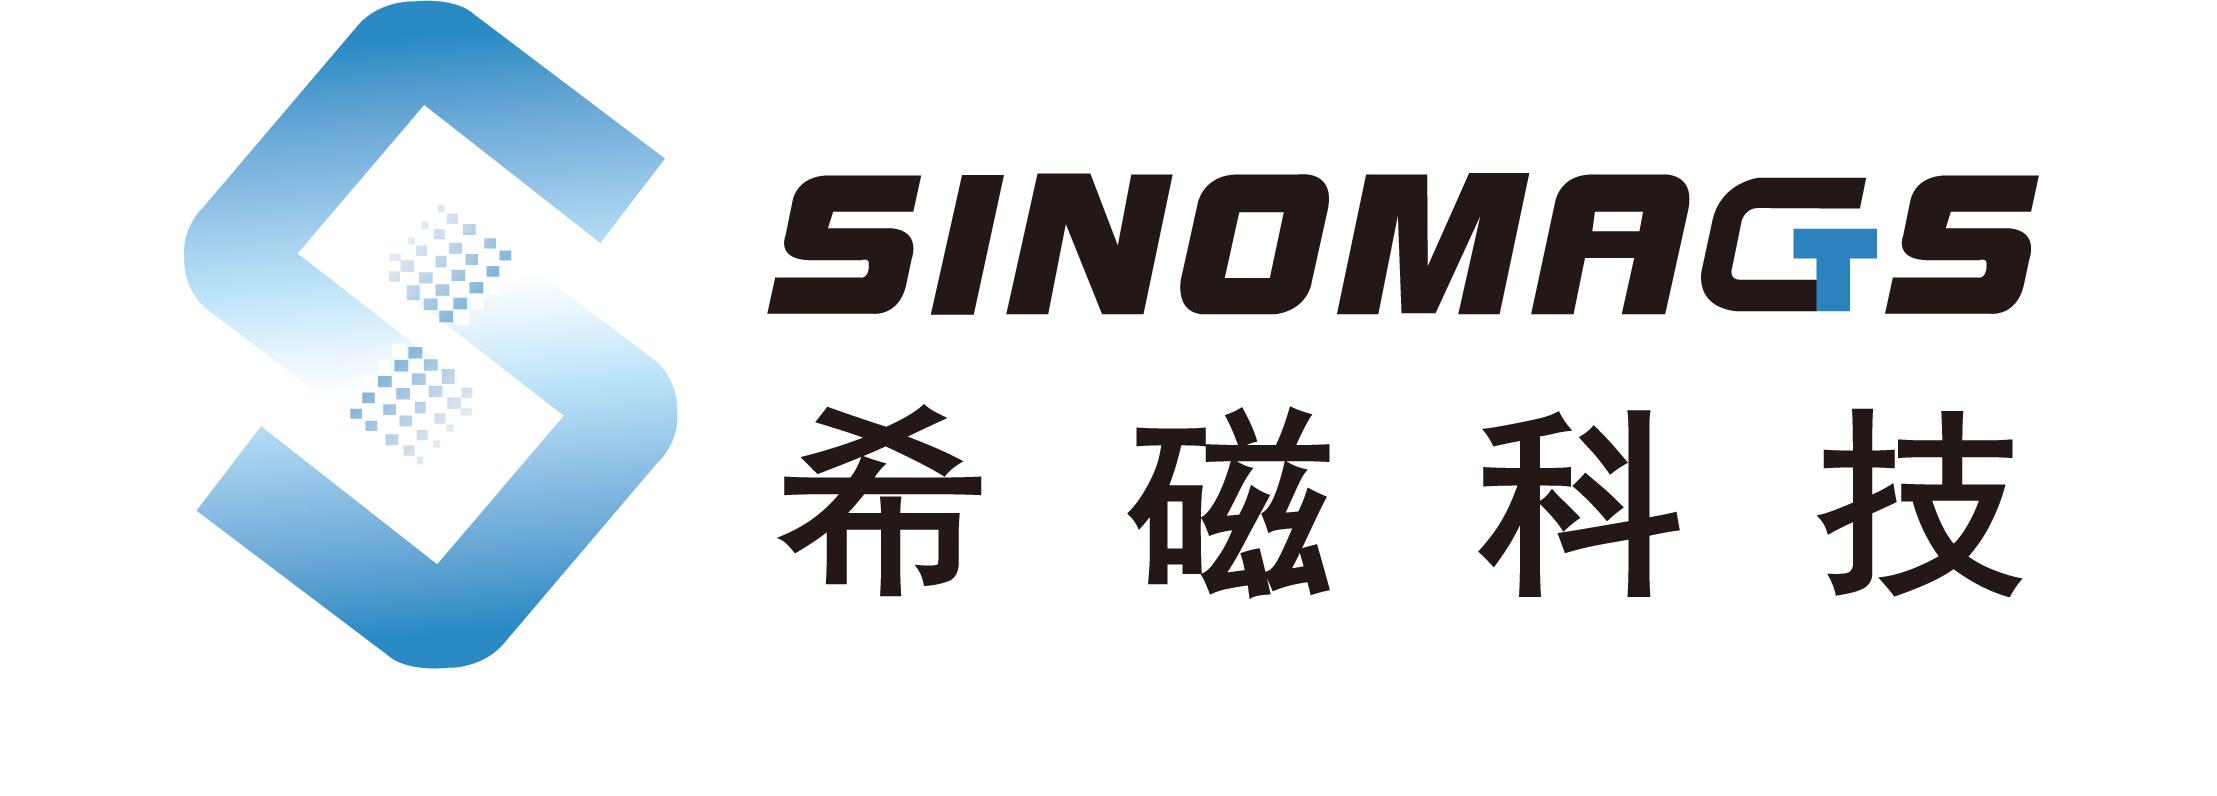 Sinomags